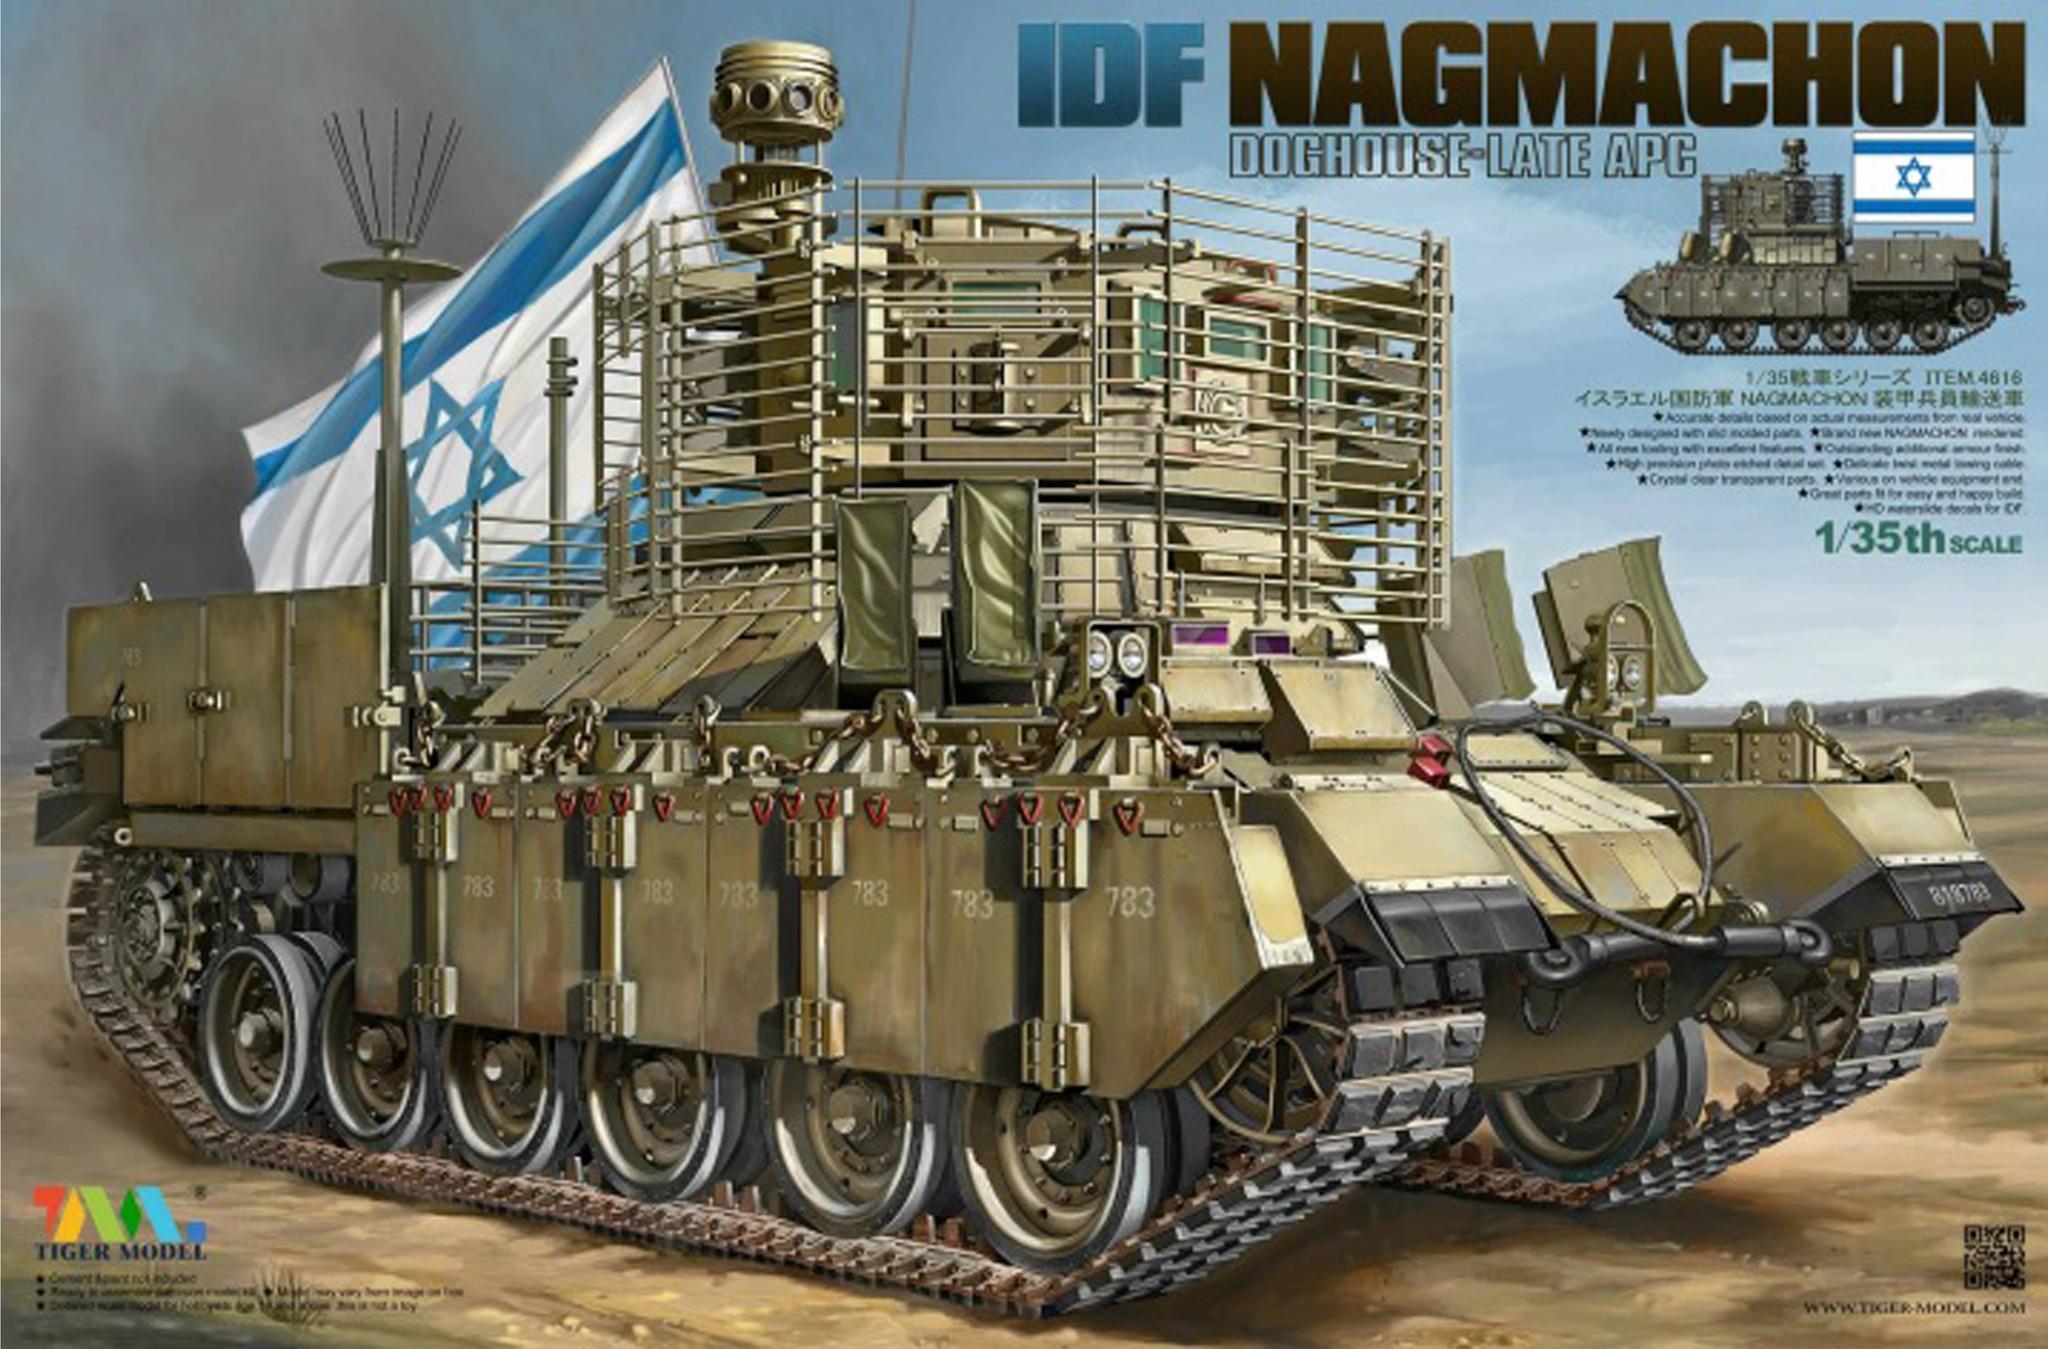 Tiger Model Nagmachon Doghouse-Late Apc - Tiger Model - Scale 1/35 - TIGE4616